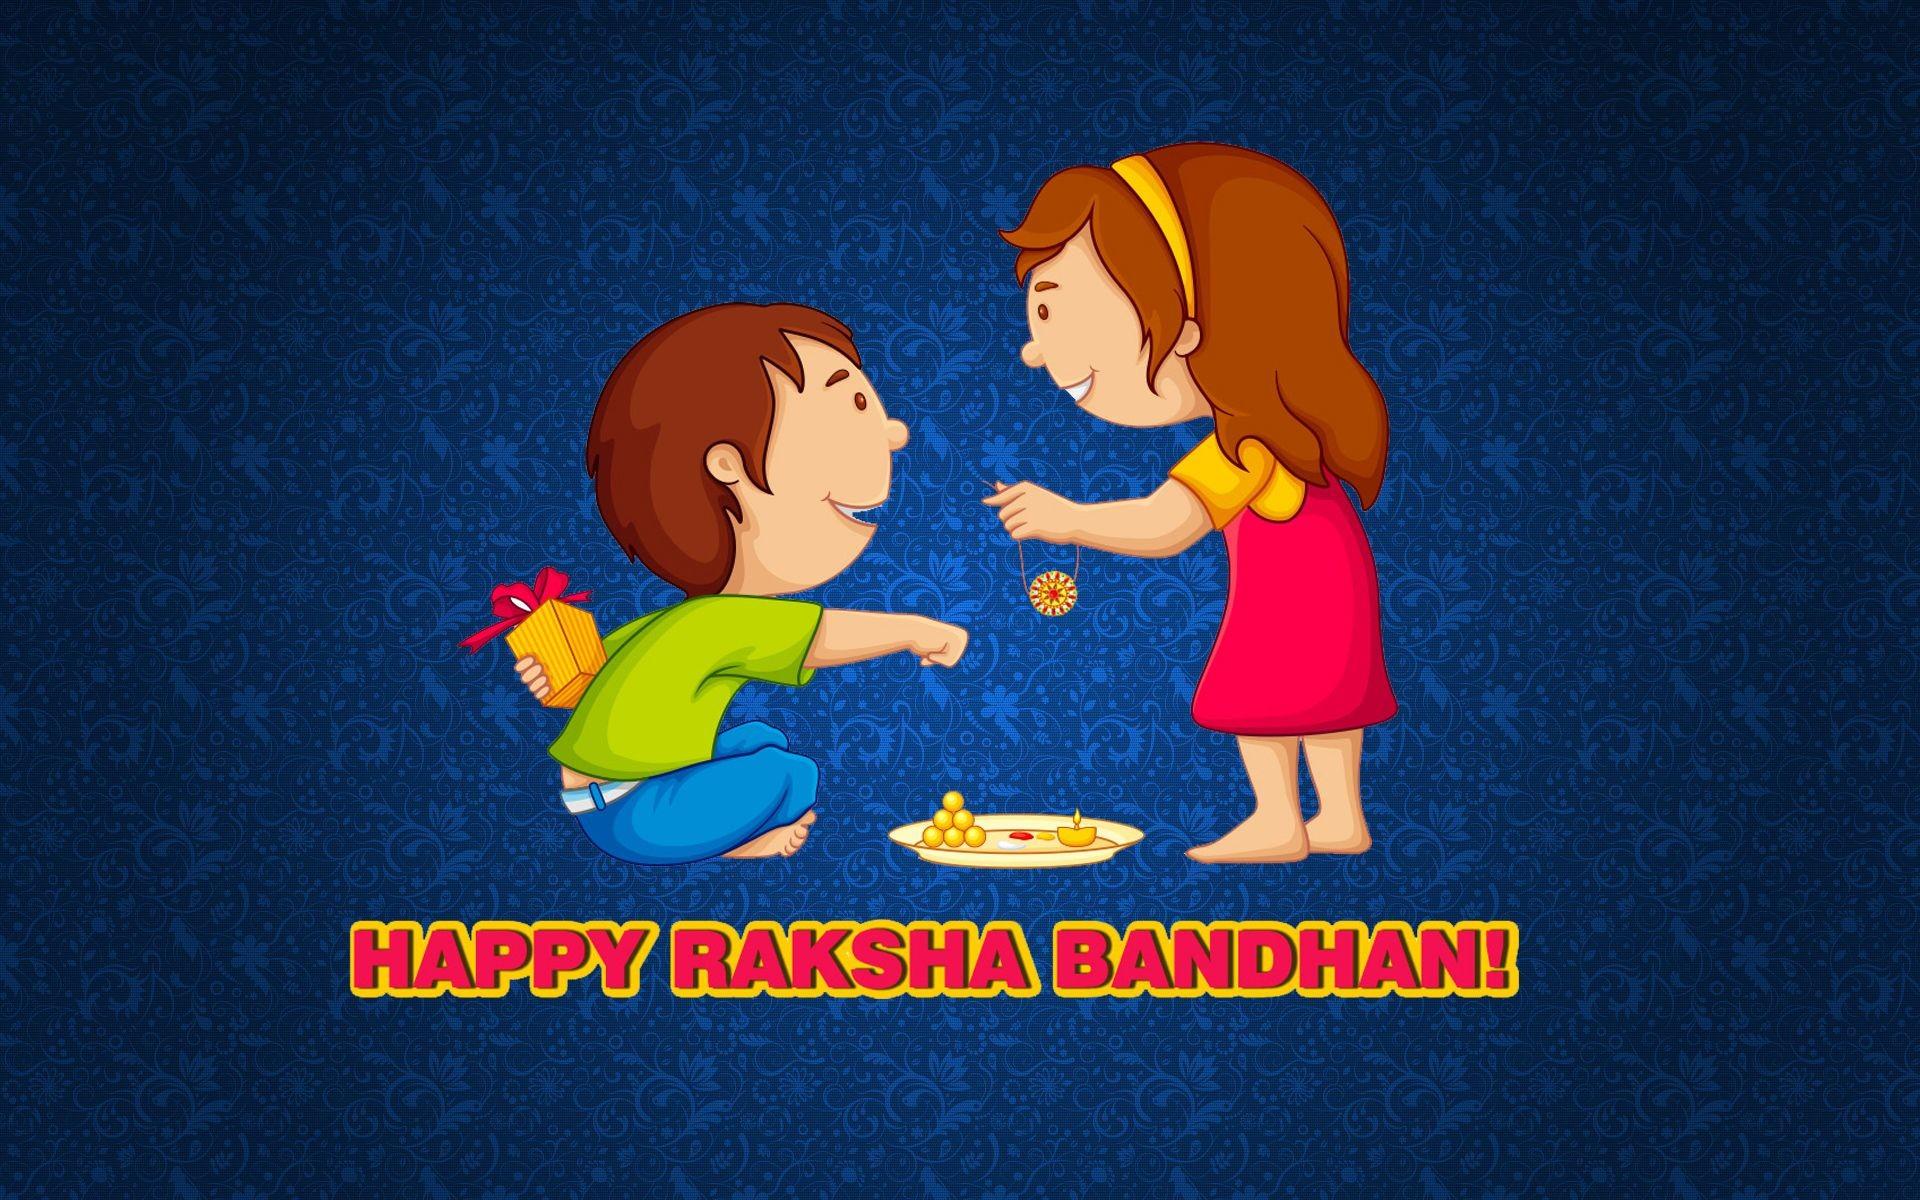 Res: 1920x1200, Happy Rakshabandhan 2014 HD Wallpaper Happy Raksha Bandhan , Rakhi,  Brother. Sister, Love , Wallpapers, images, Greetings, Pictures, Quotes,  Wishes, HD, ...